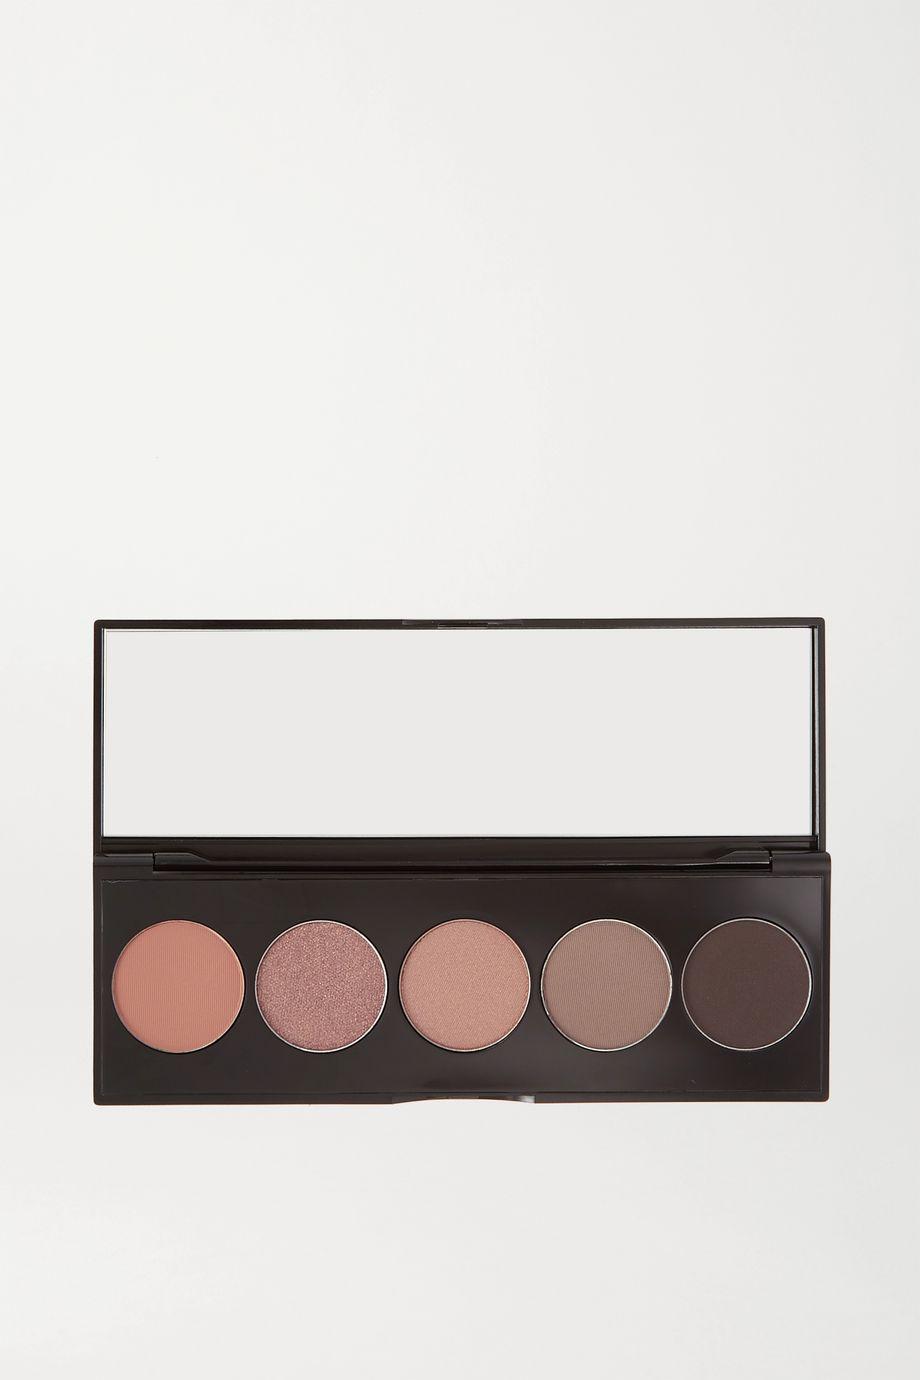 Bobbi Brown Nudes Eyeshadow Palette - Blush